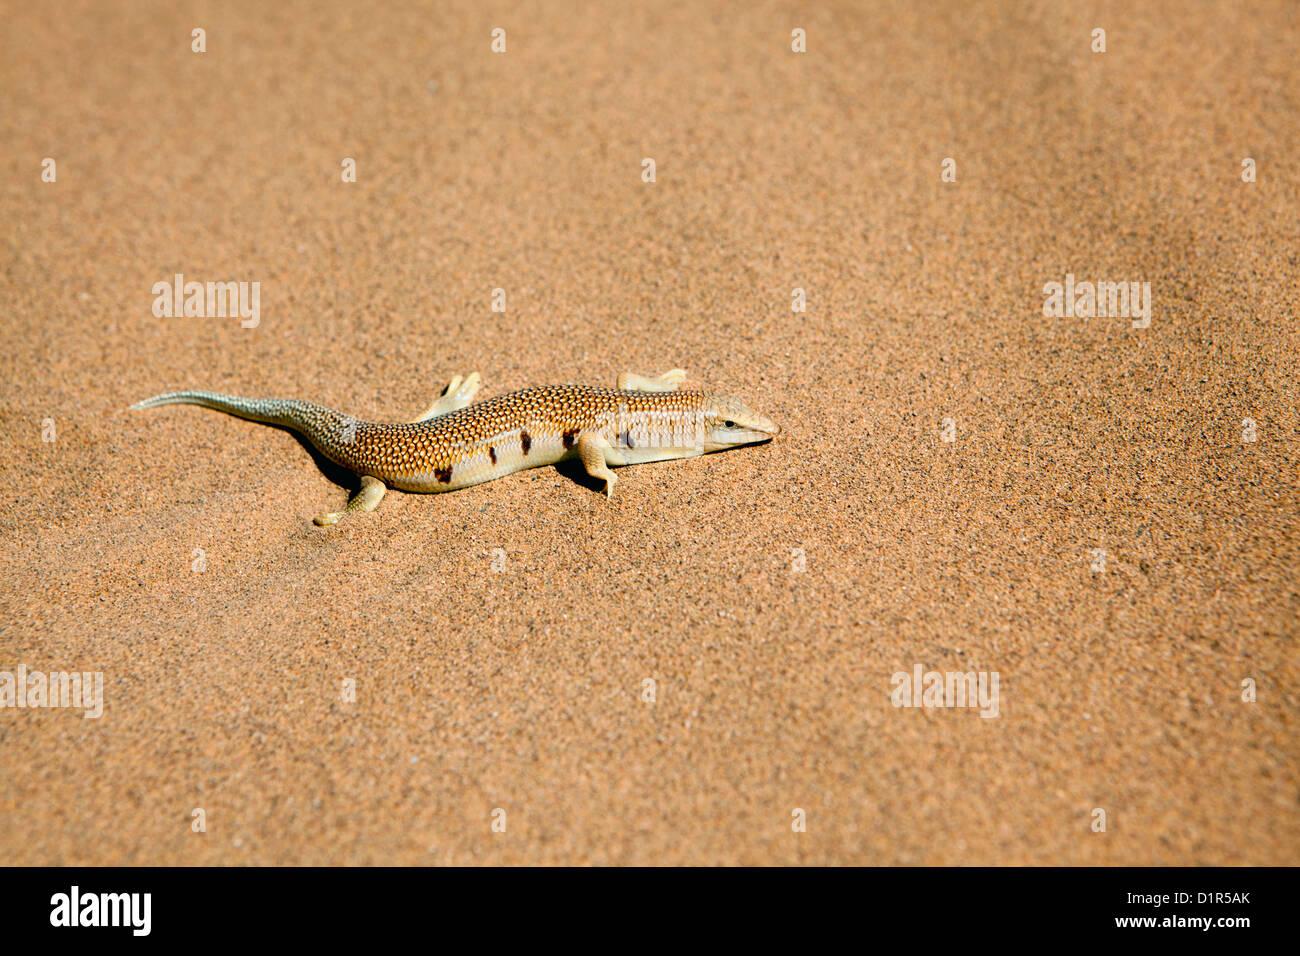 Sandfish Stock Photos Sandfish Stock Images Alamy